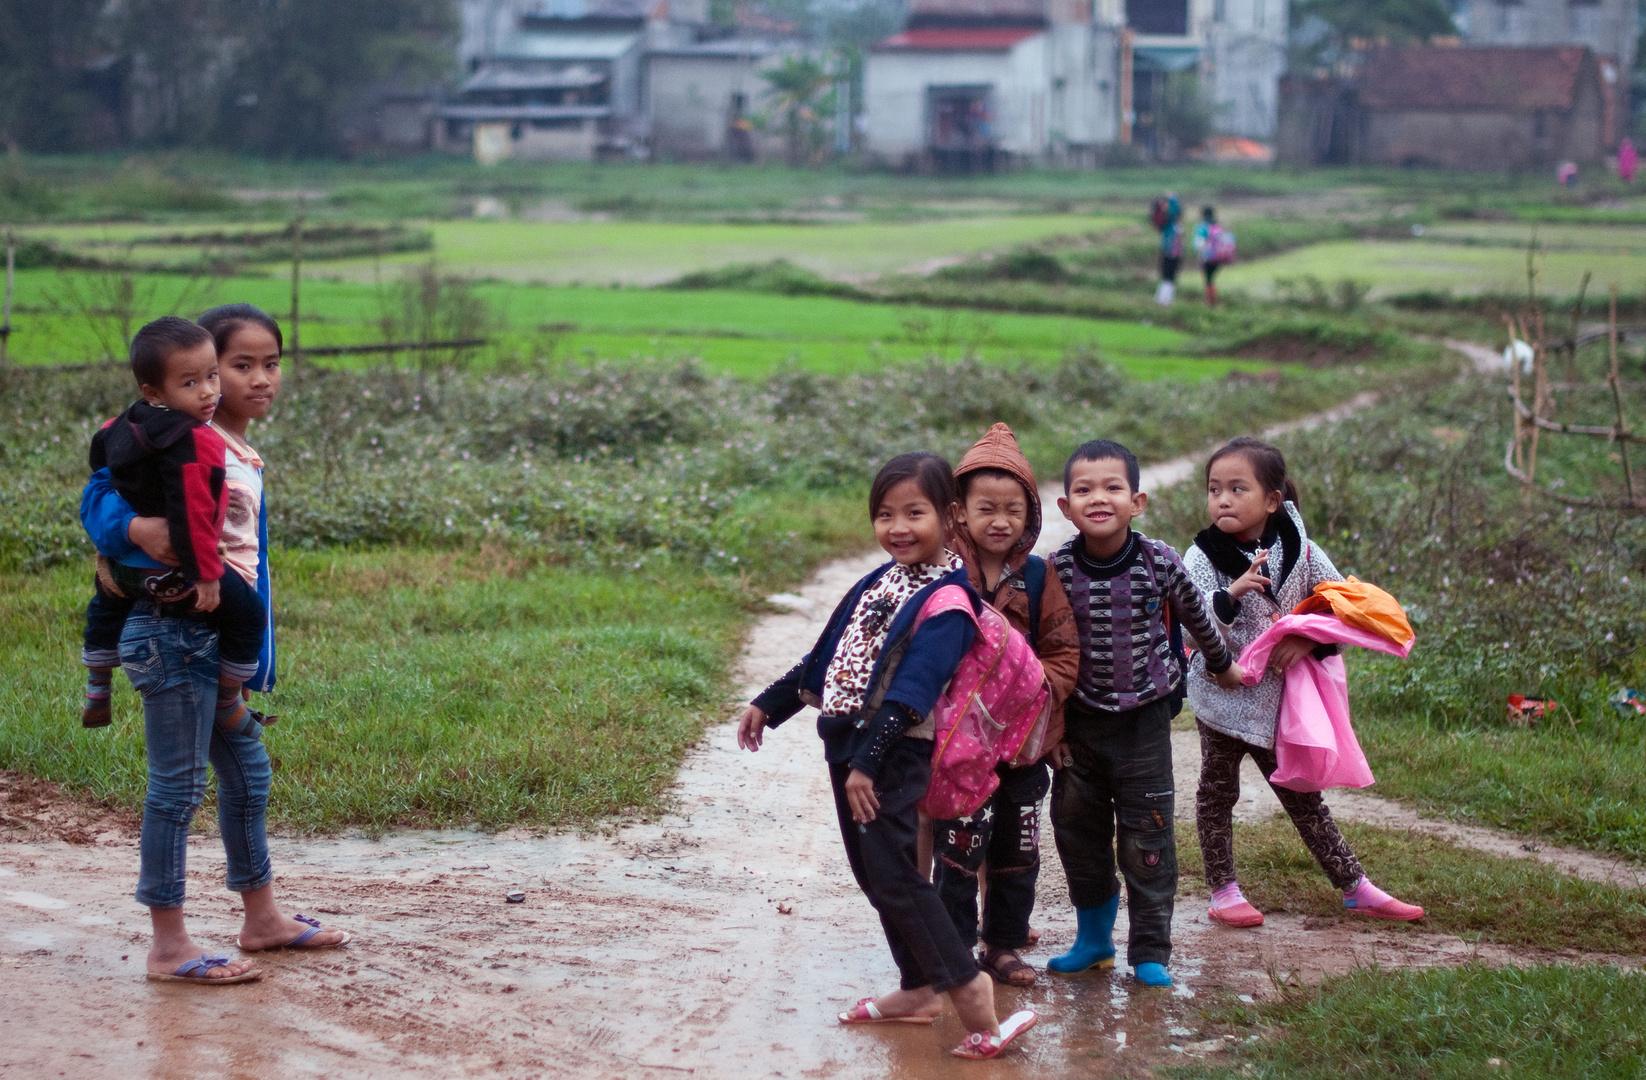 Rural school kids